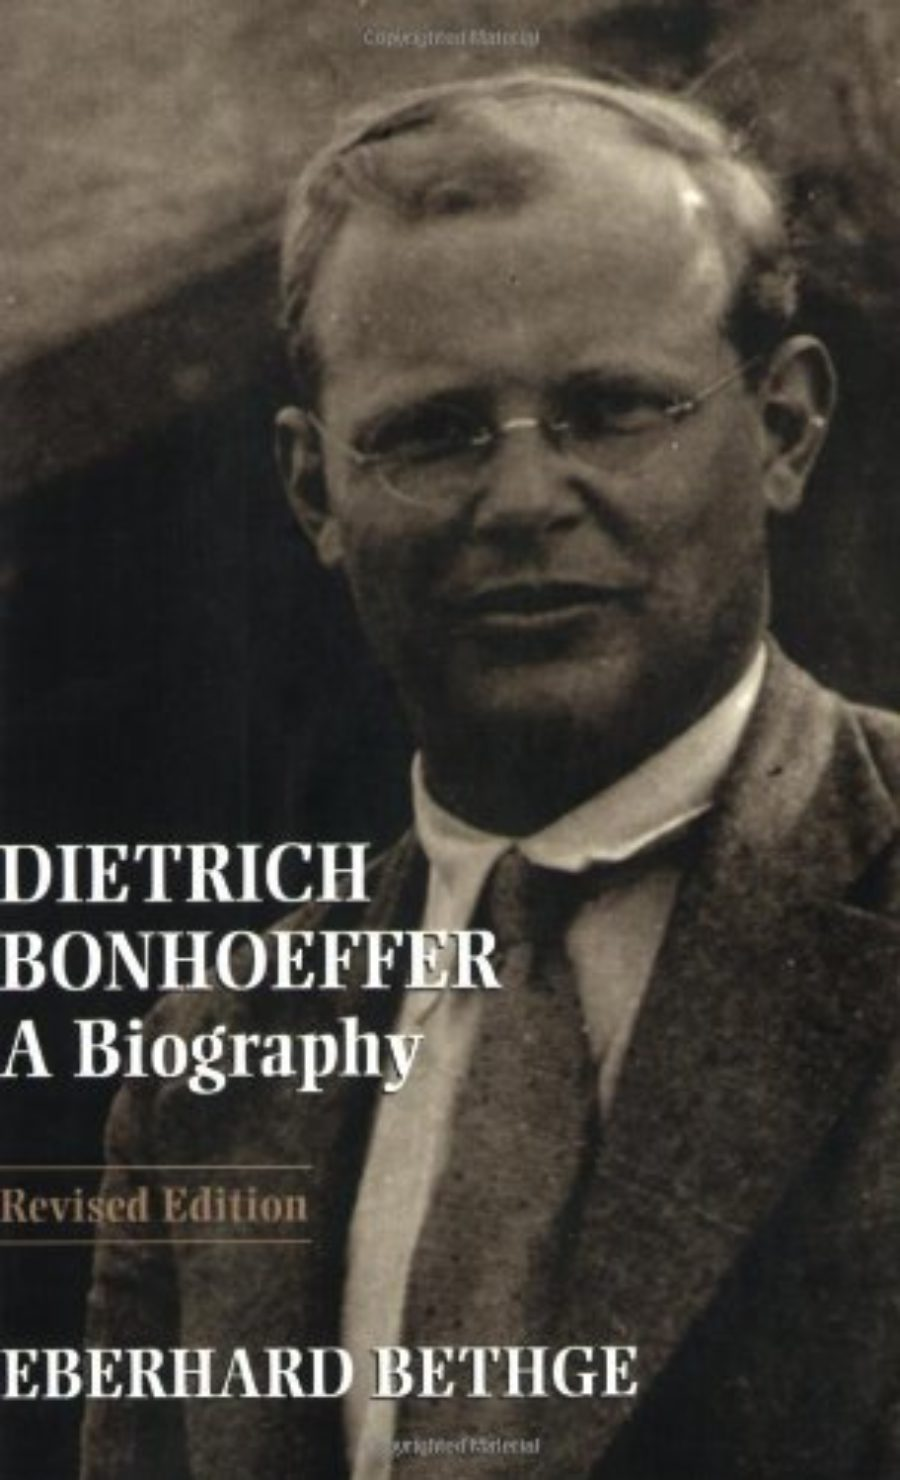 Cover of Dietrich Bonhoeffer: A Biography